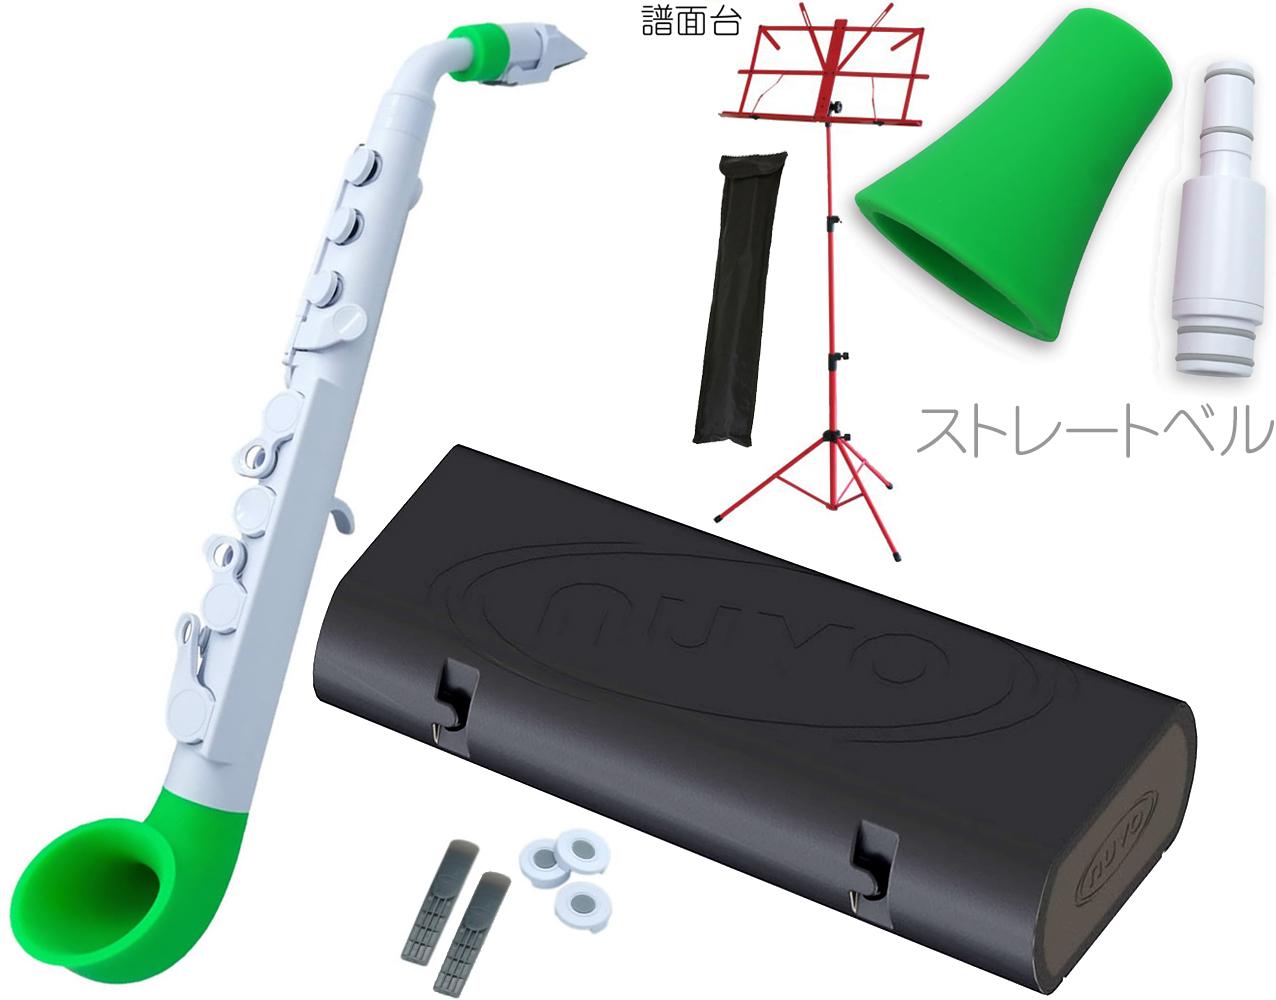 NUVO (【 ヌーボ ) jSAX ホワイト グリーン N510JWGN プラスチック製 サクソフォン N510JWGN 管楽器 サックス系 リード楽器 本体 サクソフォン 白色 緑色 Green【 jサックス WH/GN セット C】 送料無料, パイロットハウスエフエスシーマ:c31b30c7 --- officewill.xsrv.jp